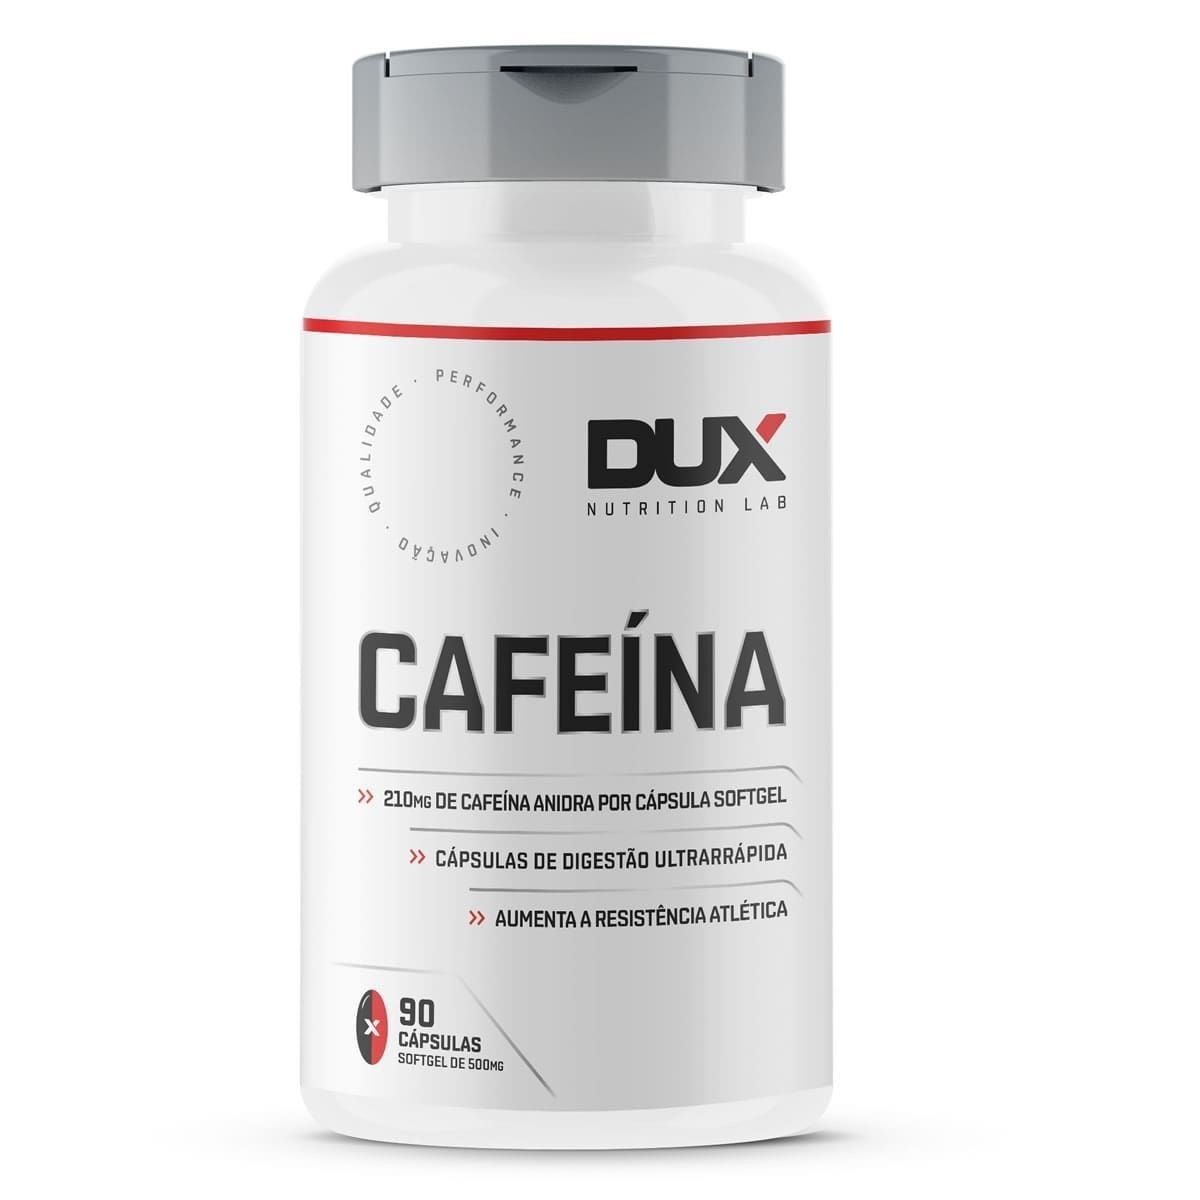 Cafeína Dux - 90 Cápsulas